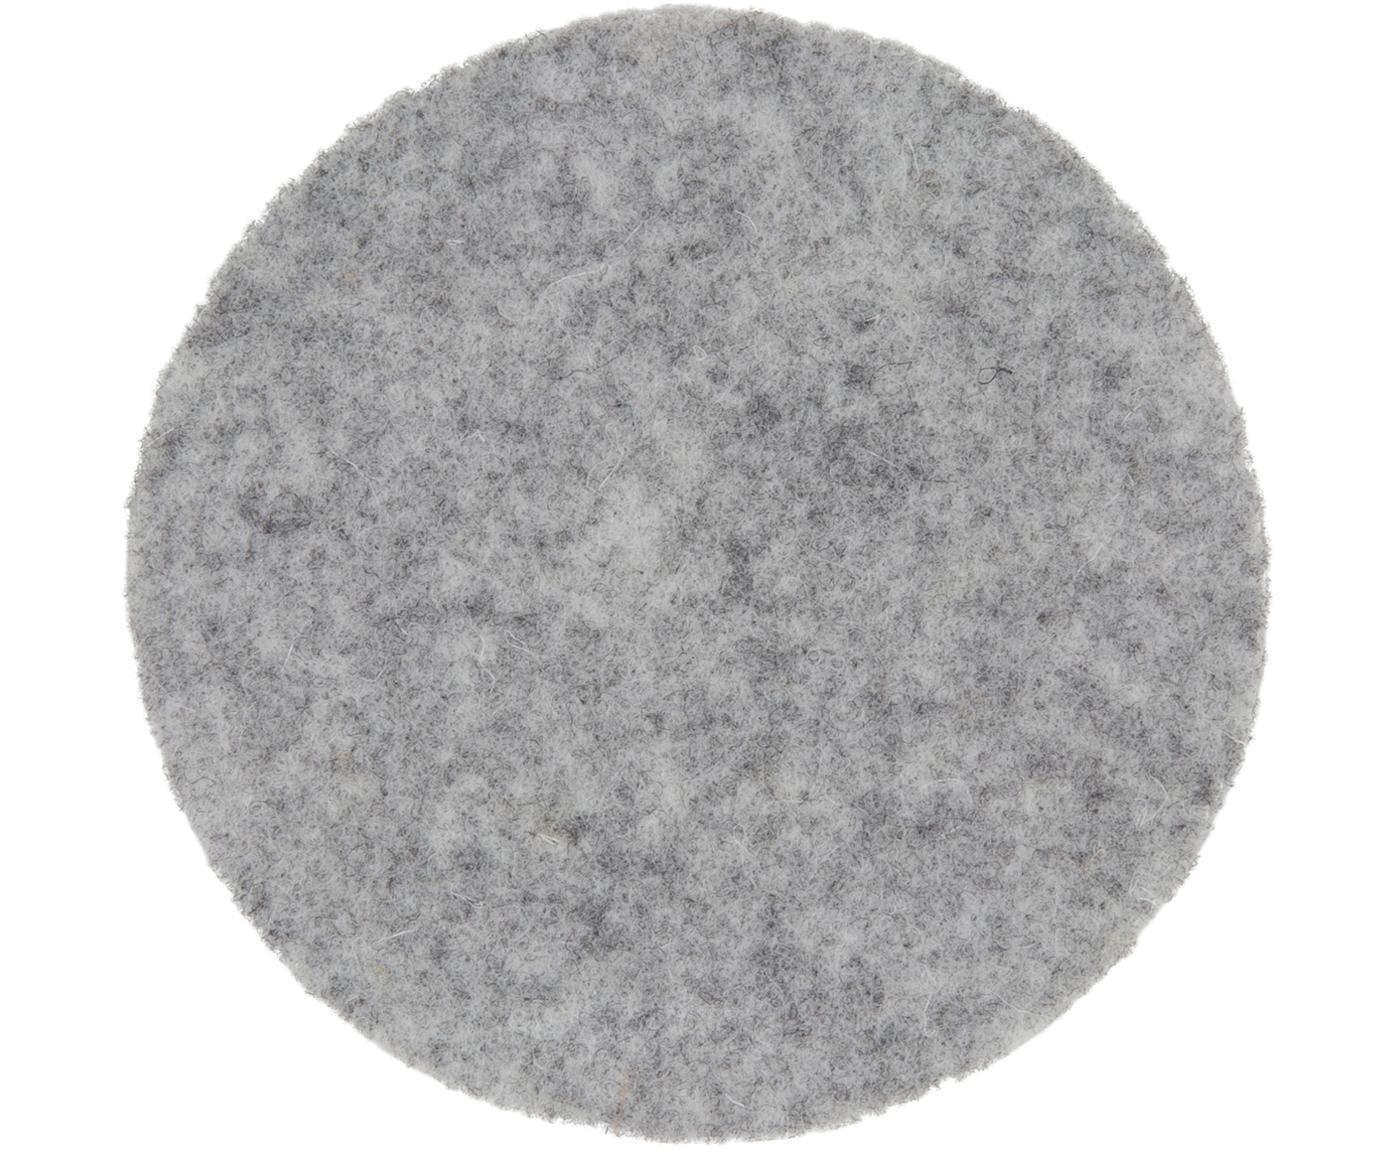 Wollfilz-Untersetzer Leandra, 6 Stück, 90% Wolle, 10% Polyethylen, Hellgrau, Ø 10 cm